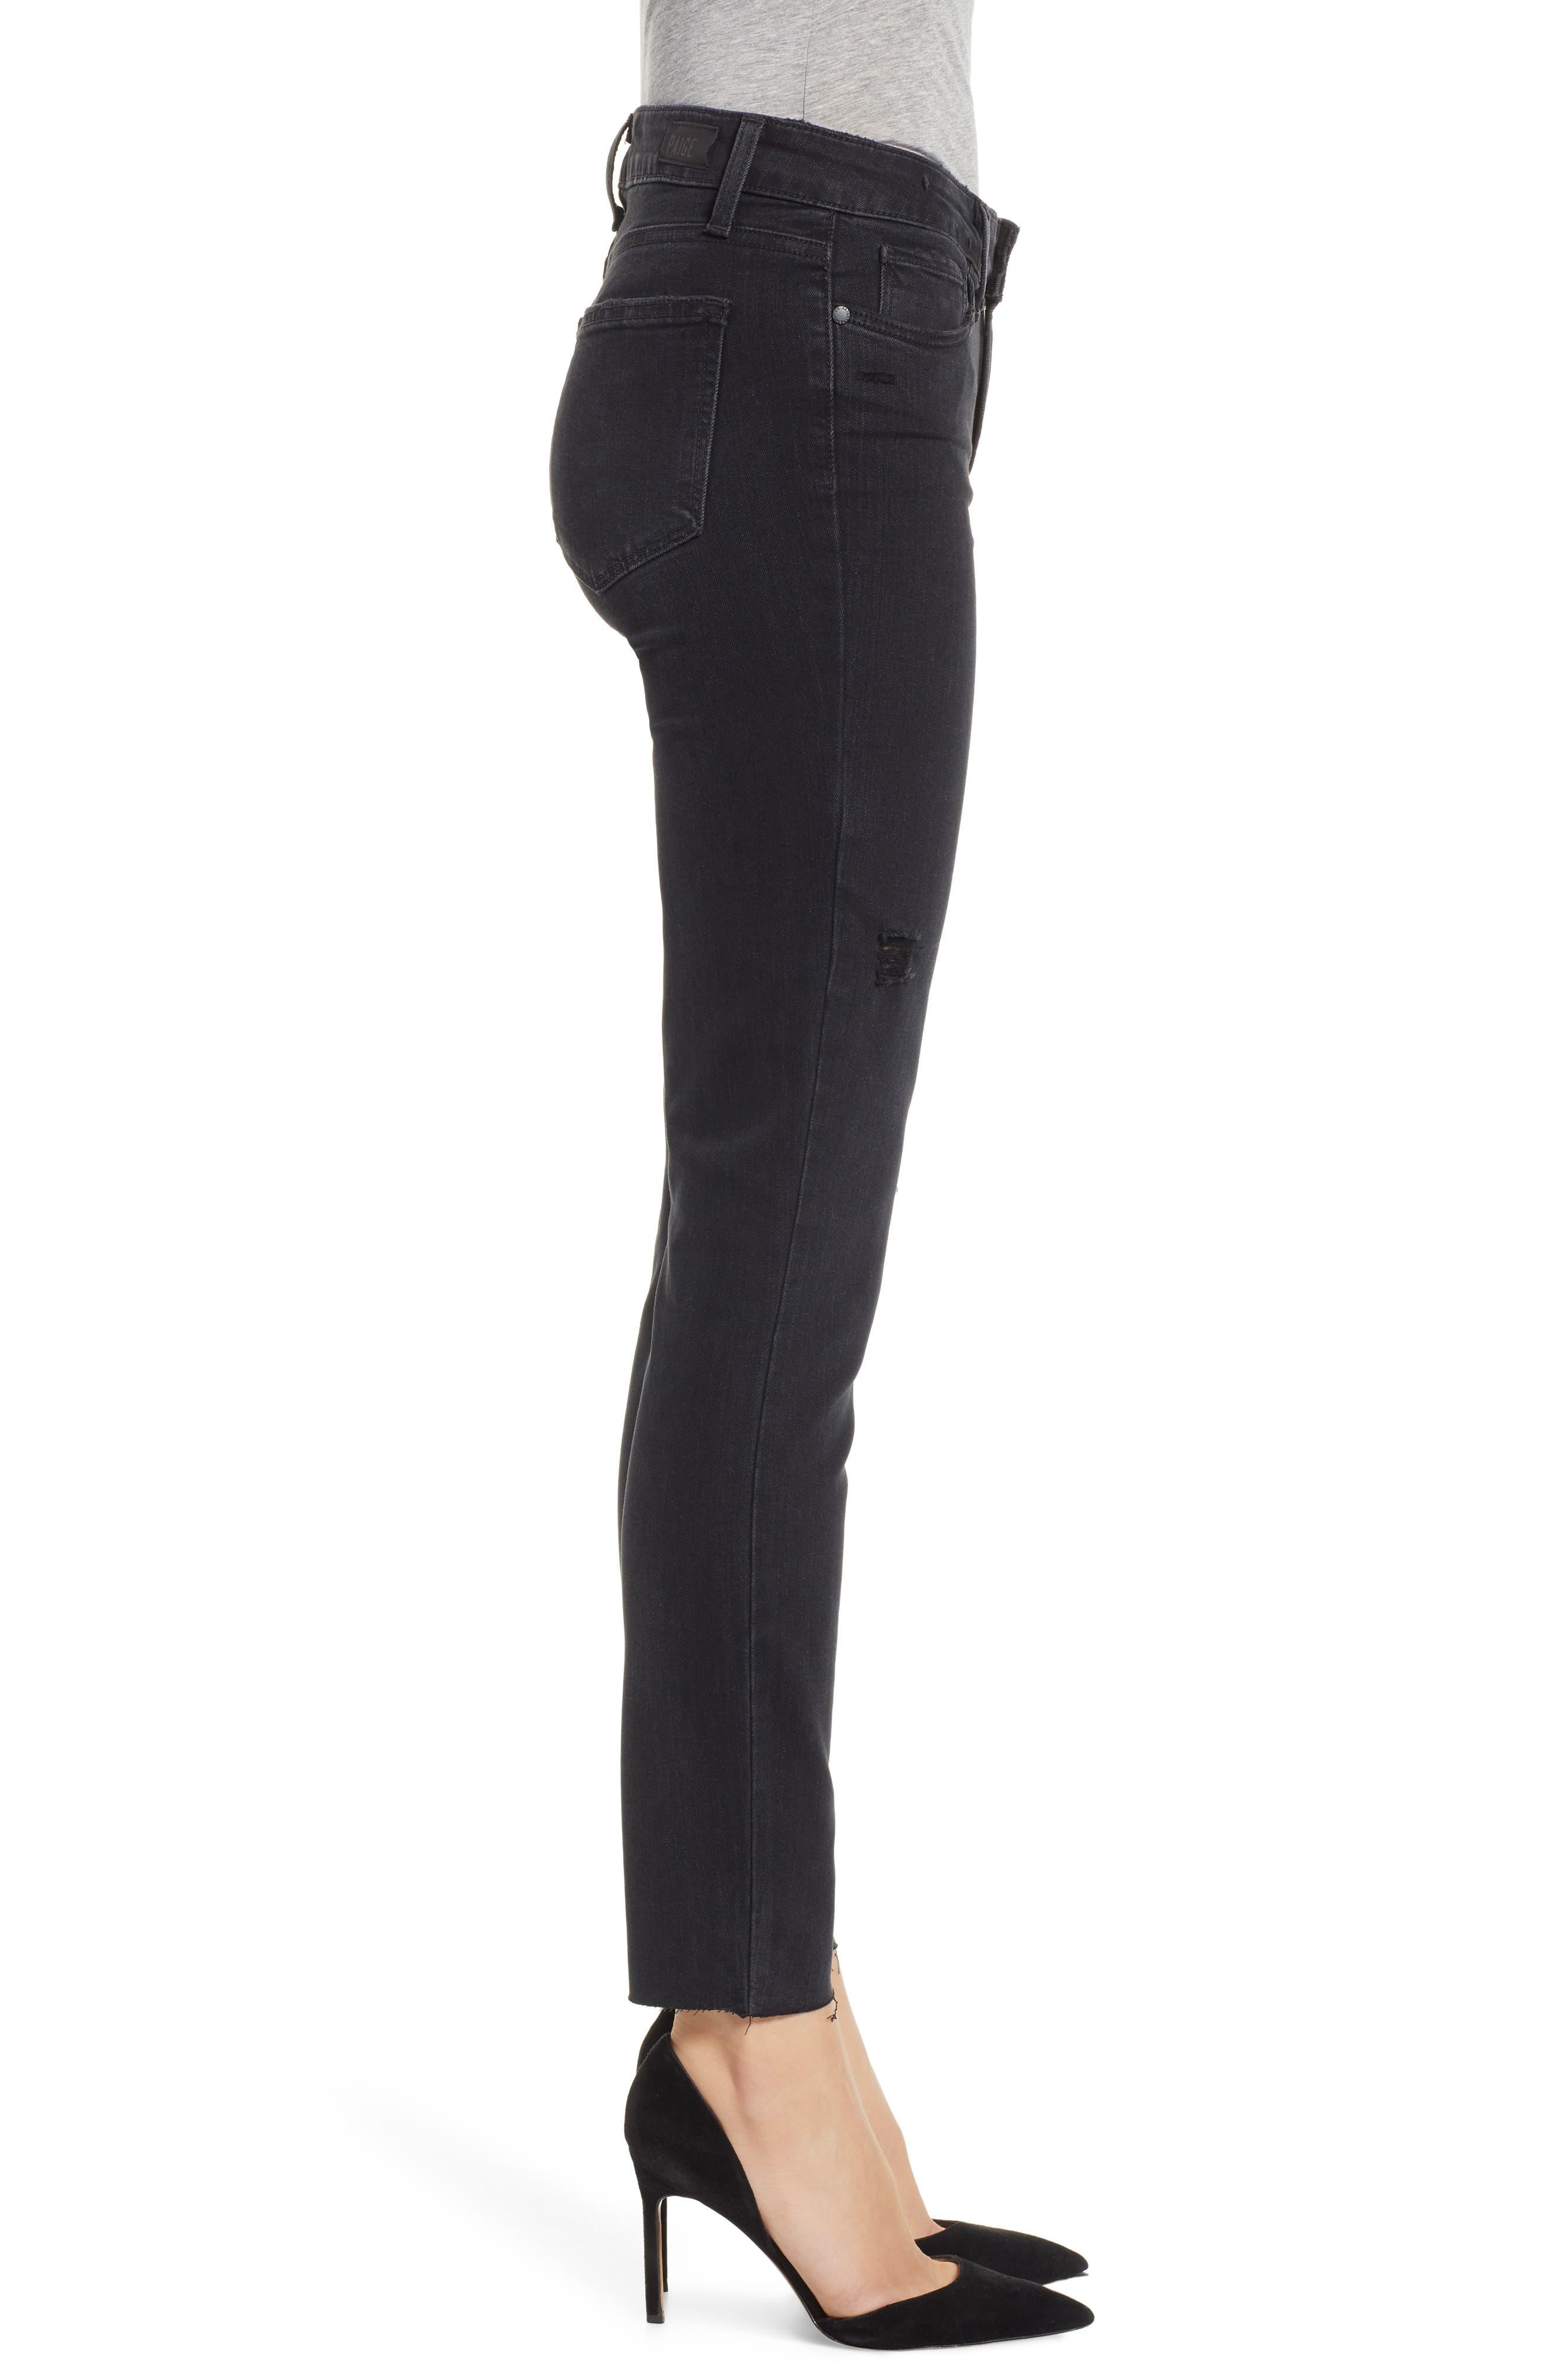 PAIGE, Transcend - Verdugo Ankle Skinny Jeans, Alternate thumbnail 4, color, 001